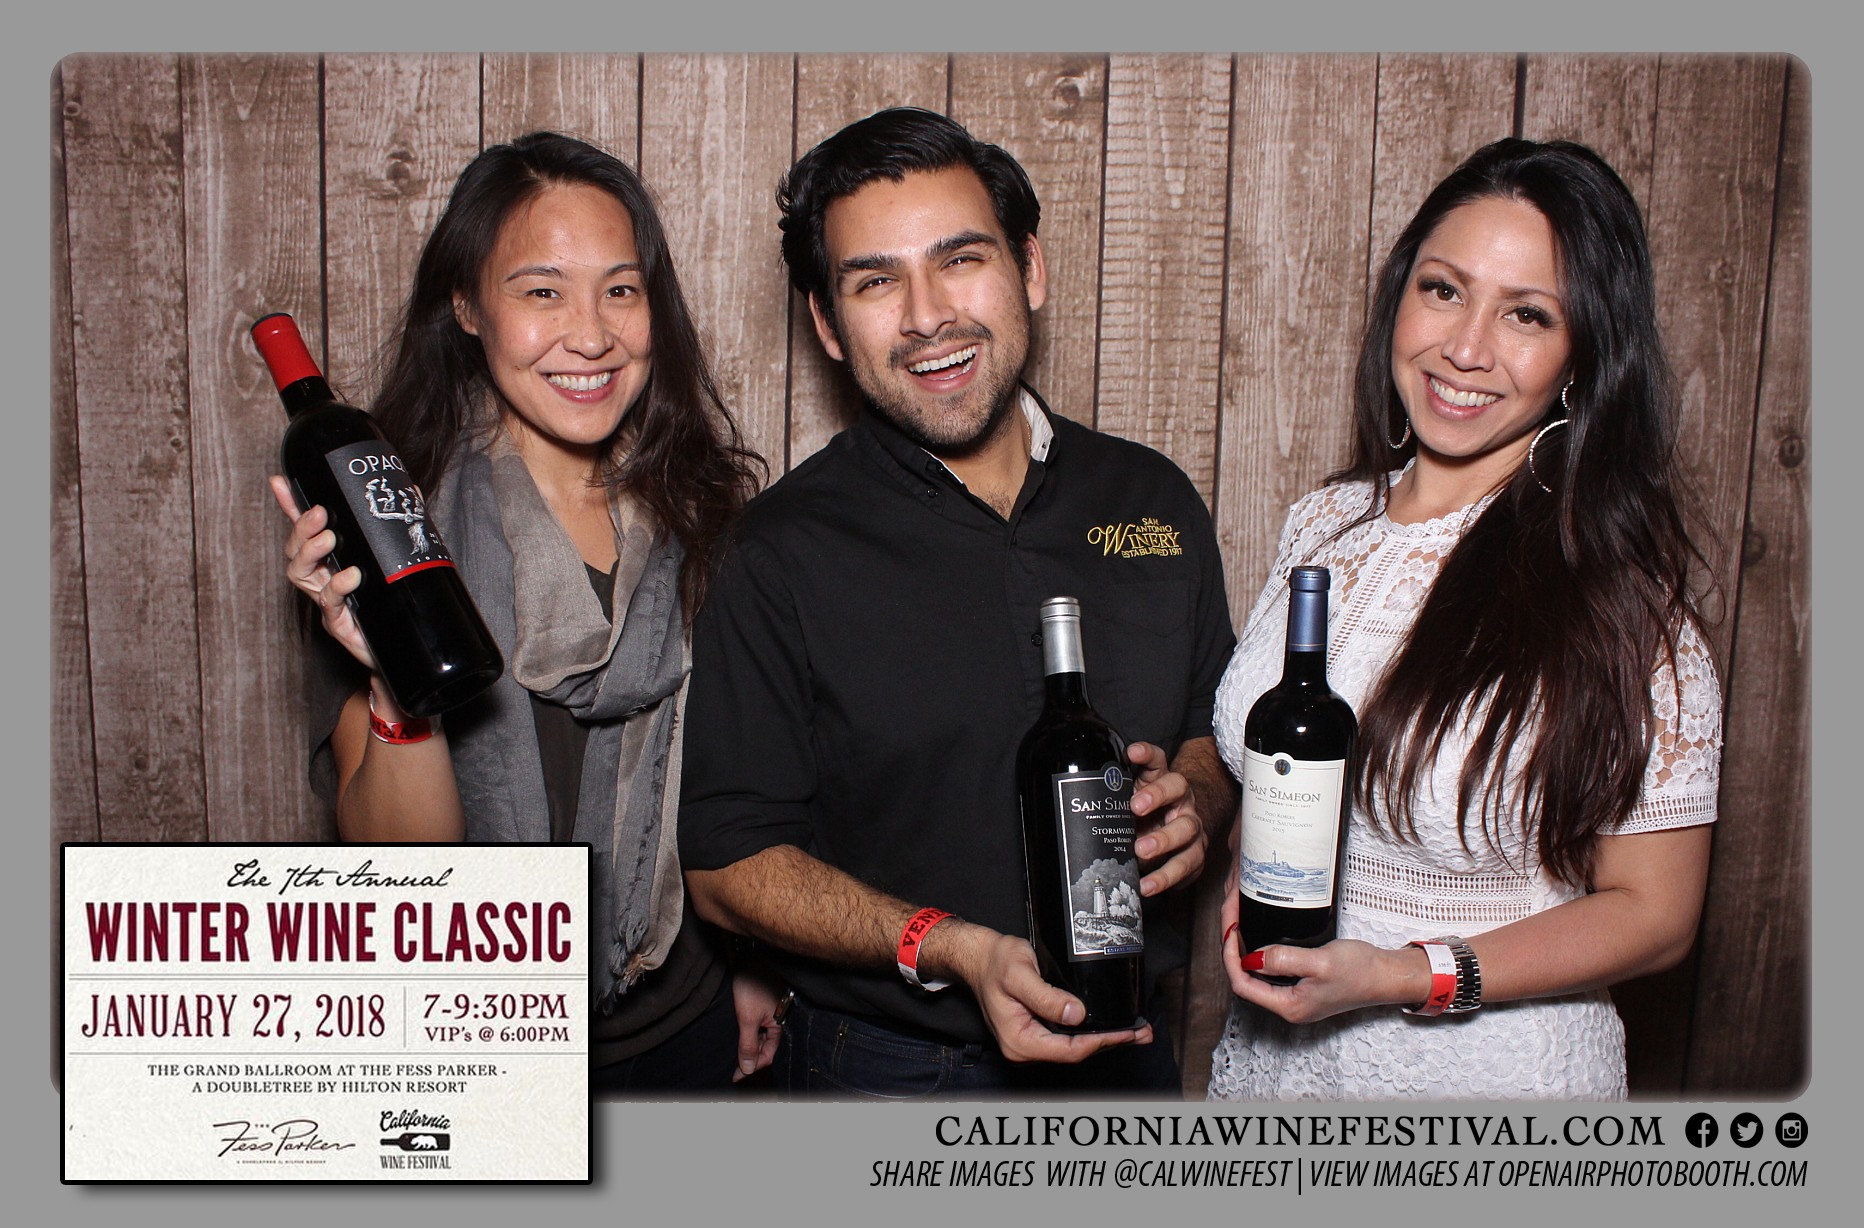 Winter Wine Classic Photo Booth 1